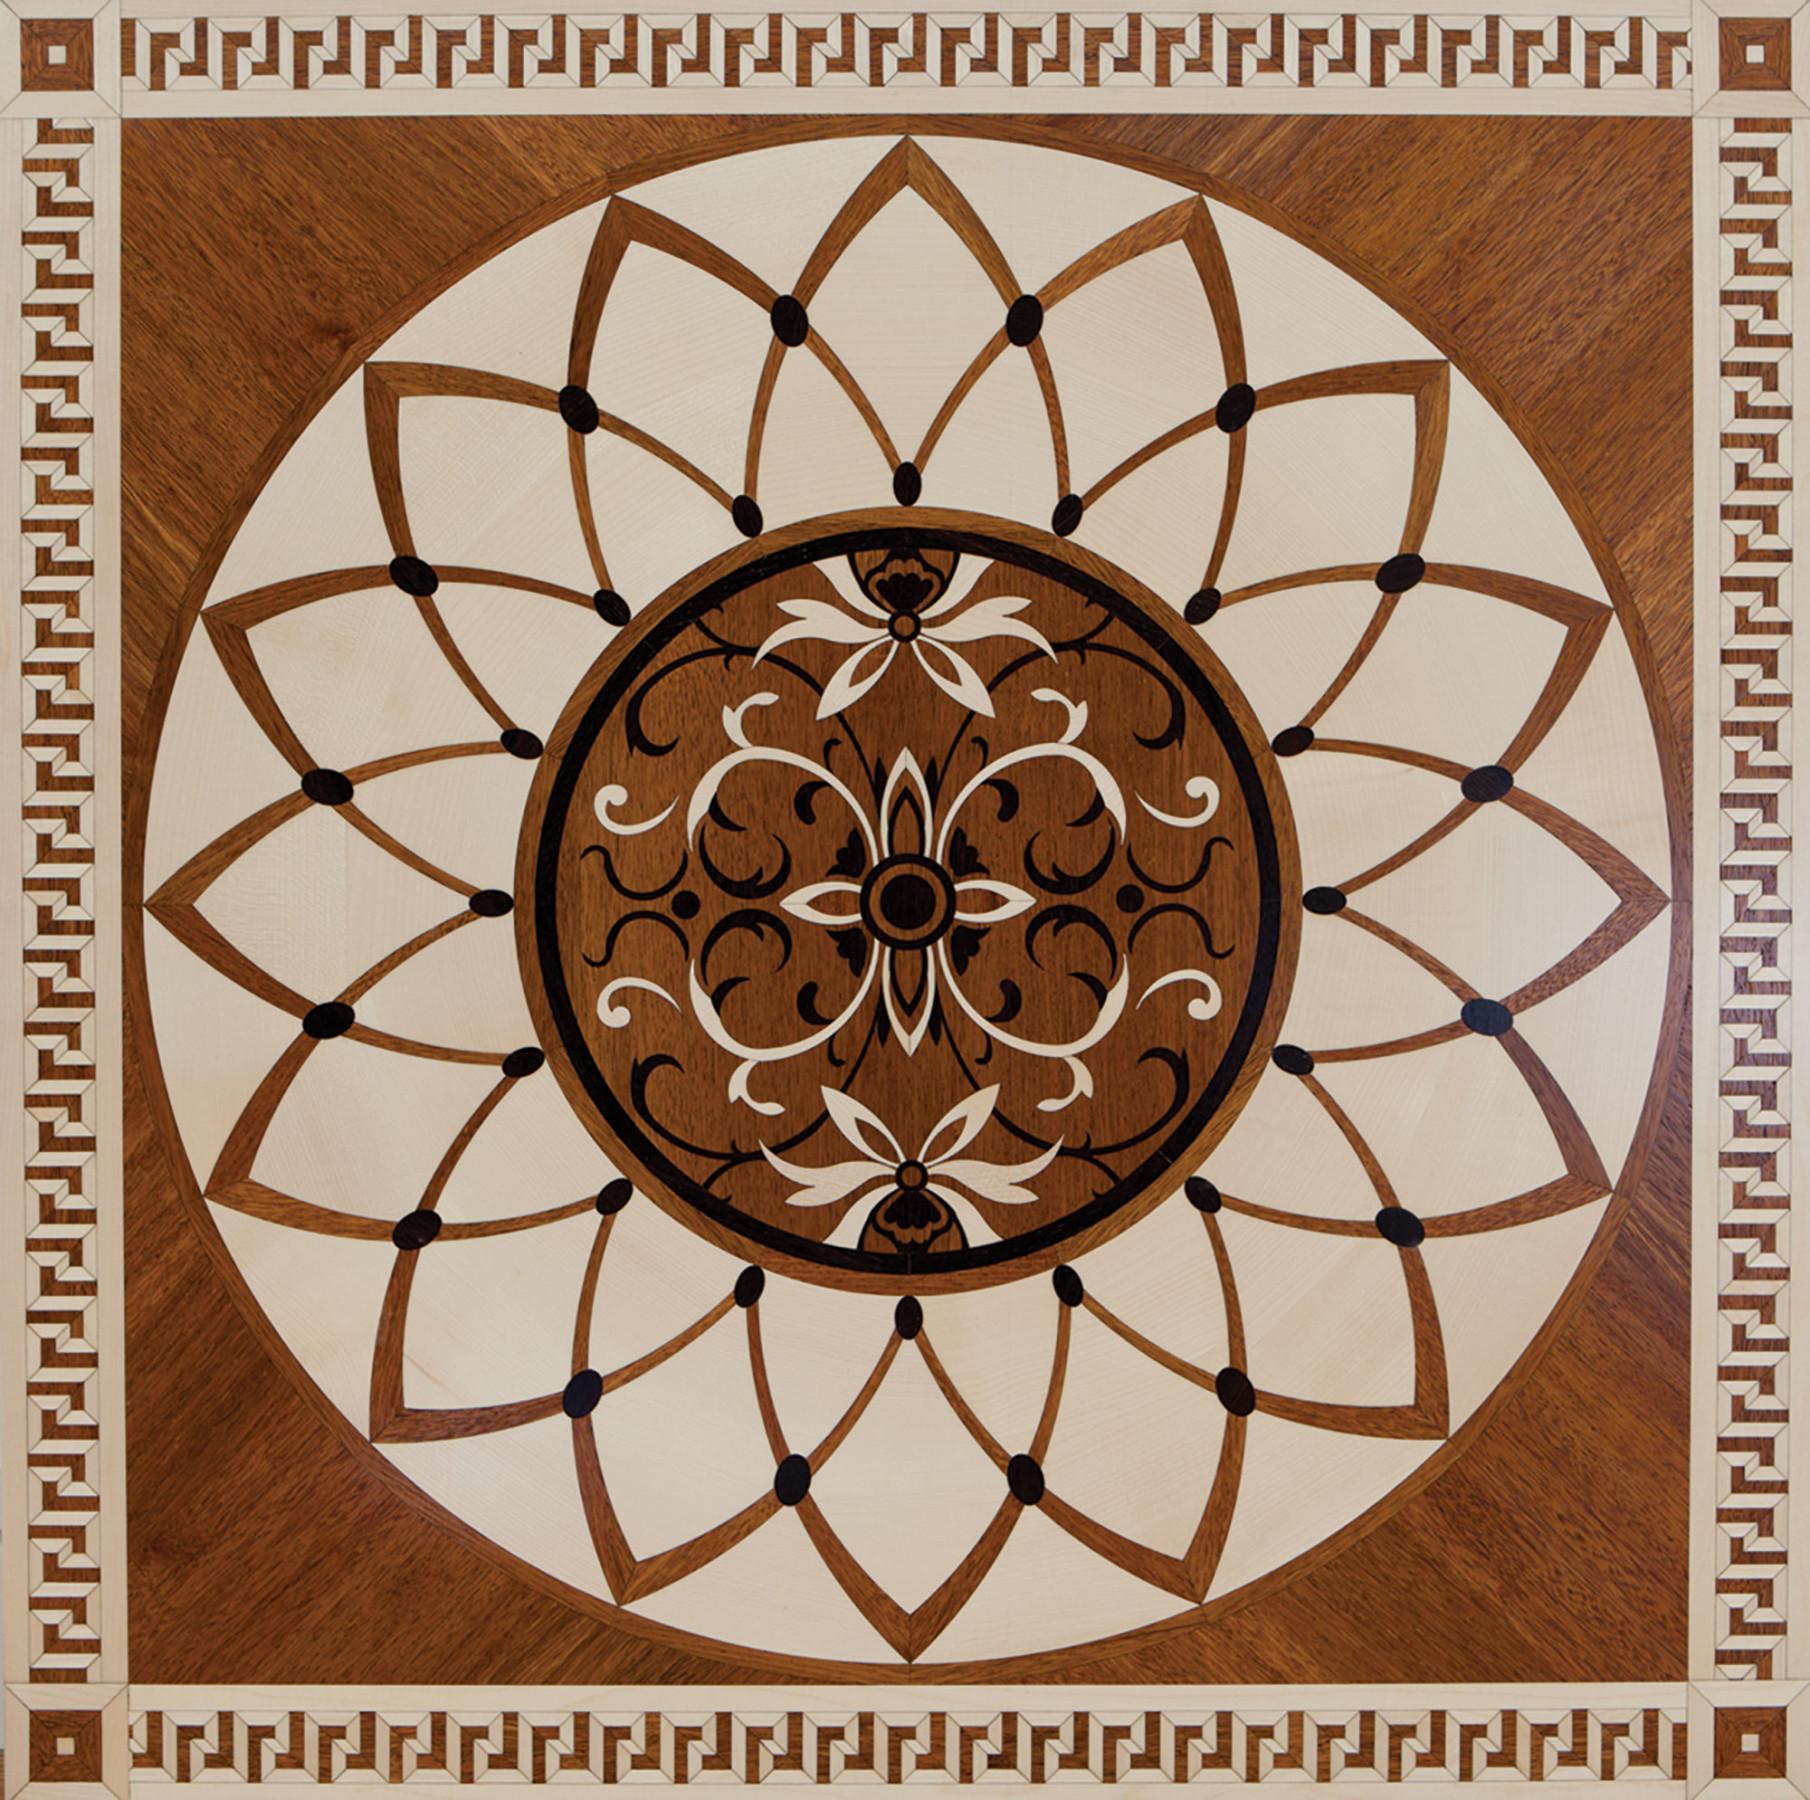 Centrepiece – MOD 483 | Element 7